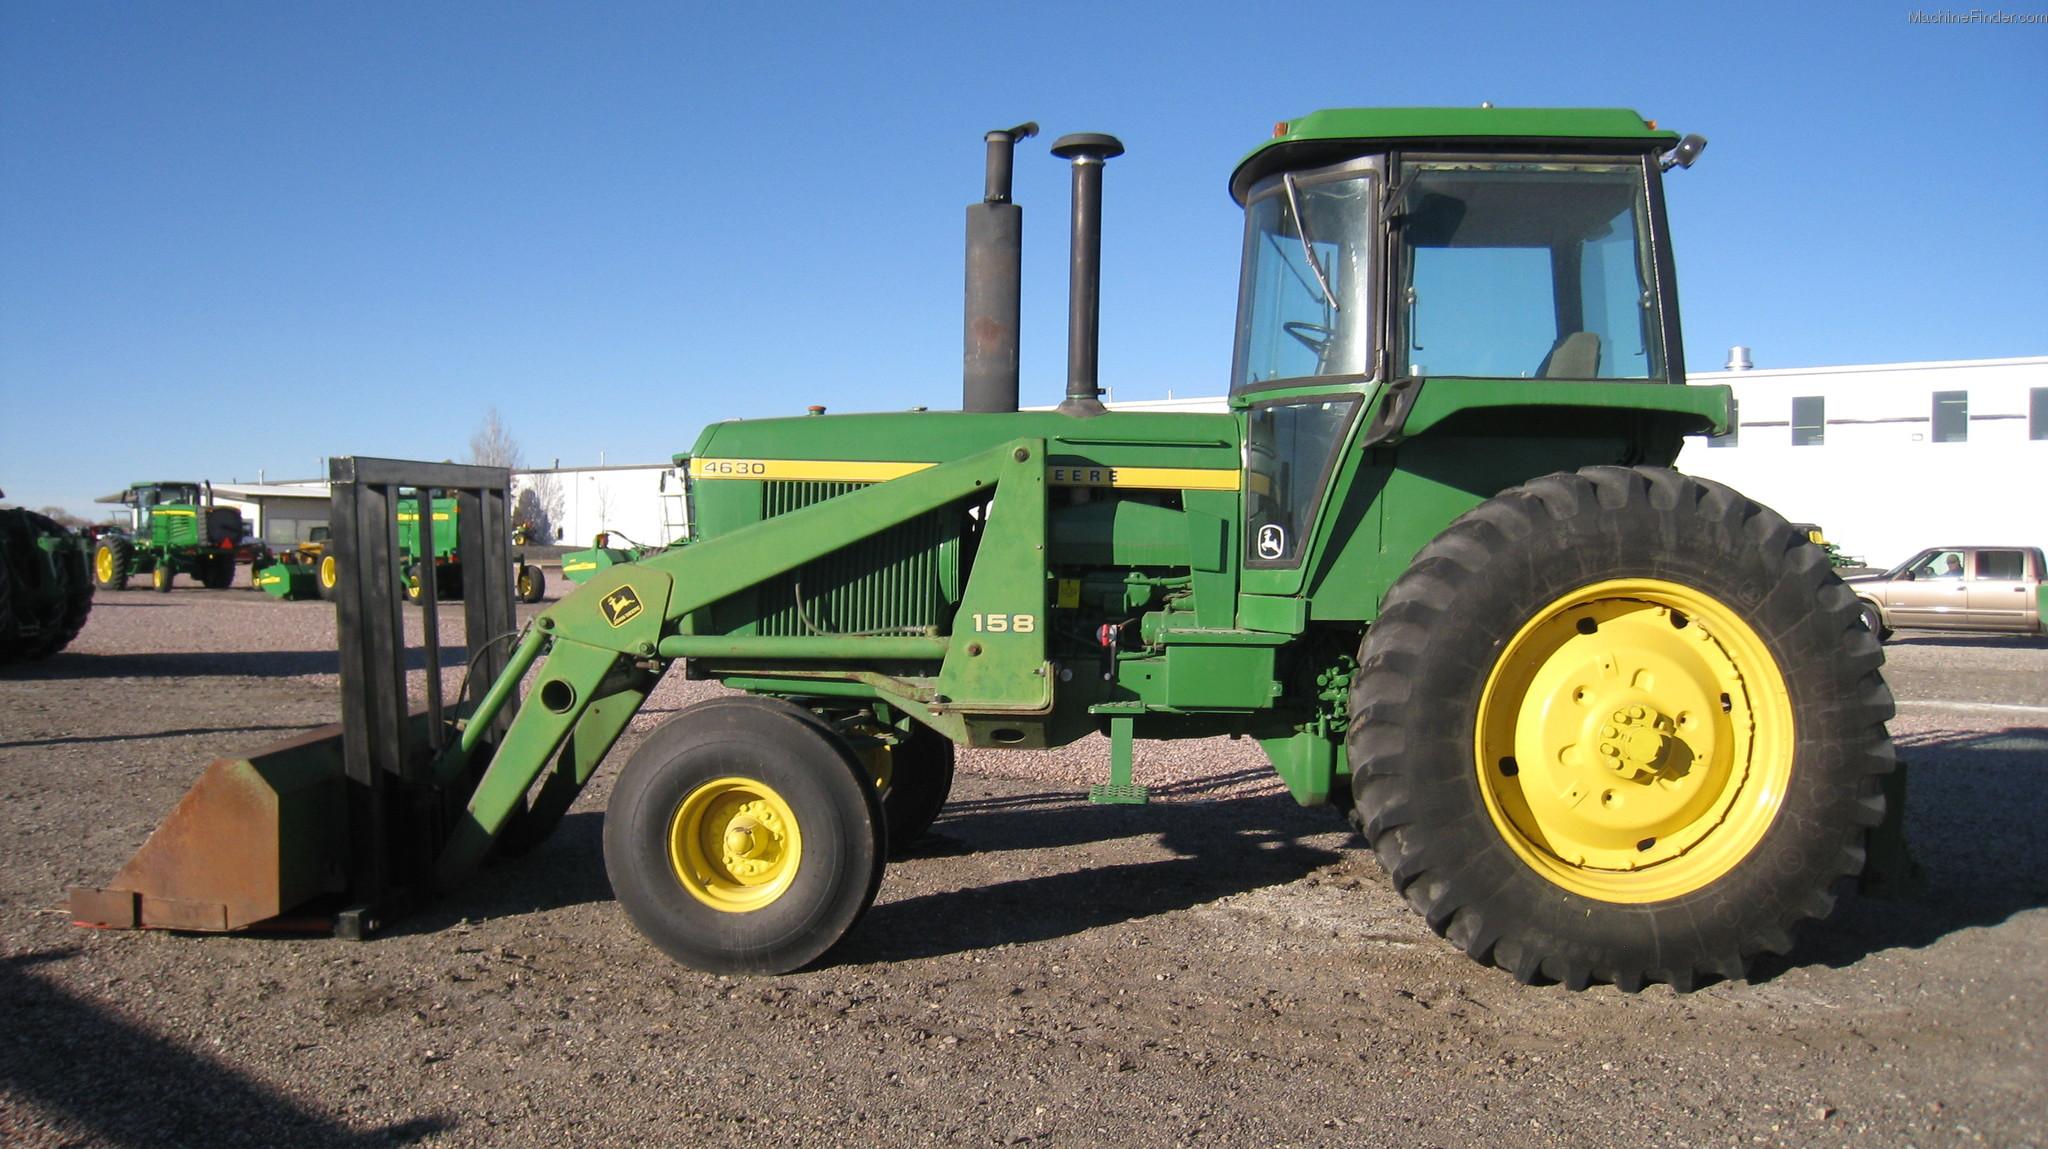 John Deere 4630 166 Hp Tractor Generation Ii Series Wiring Harness Parts Fuel Tanks Abilene Machine Inc